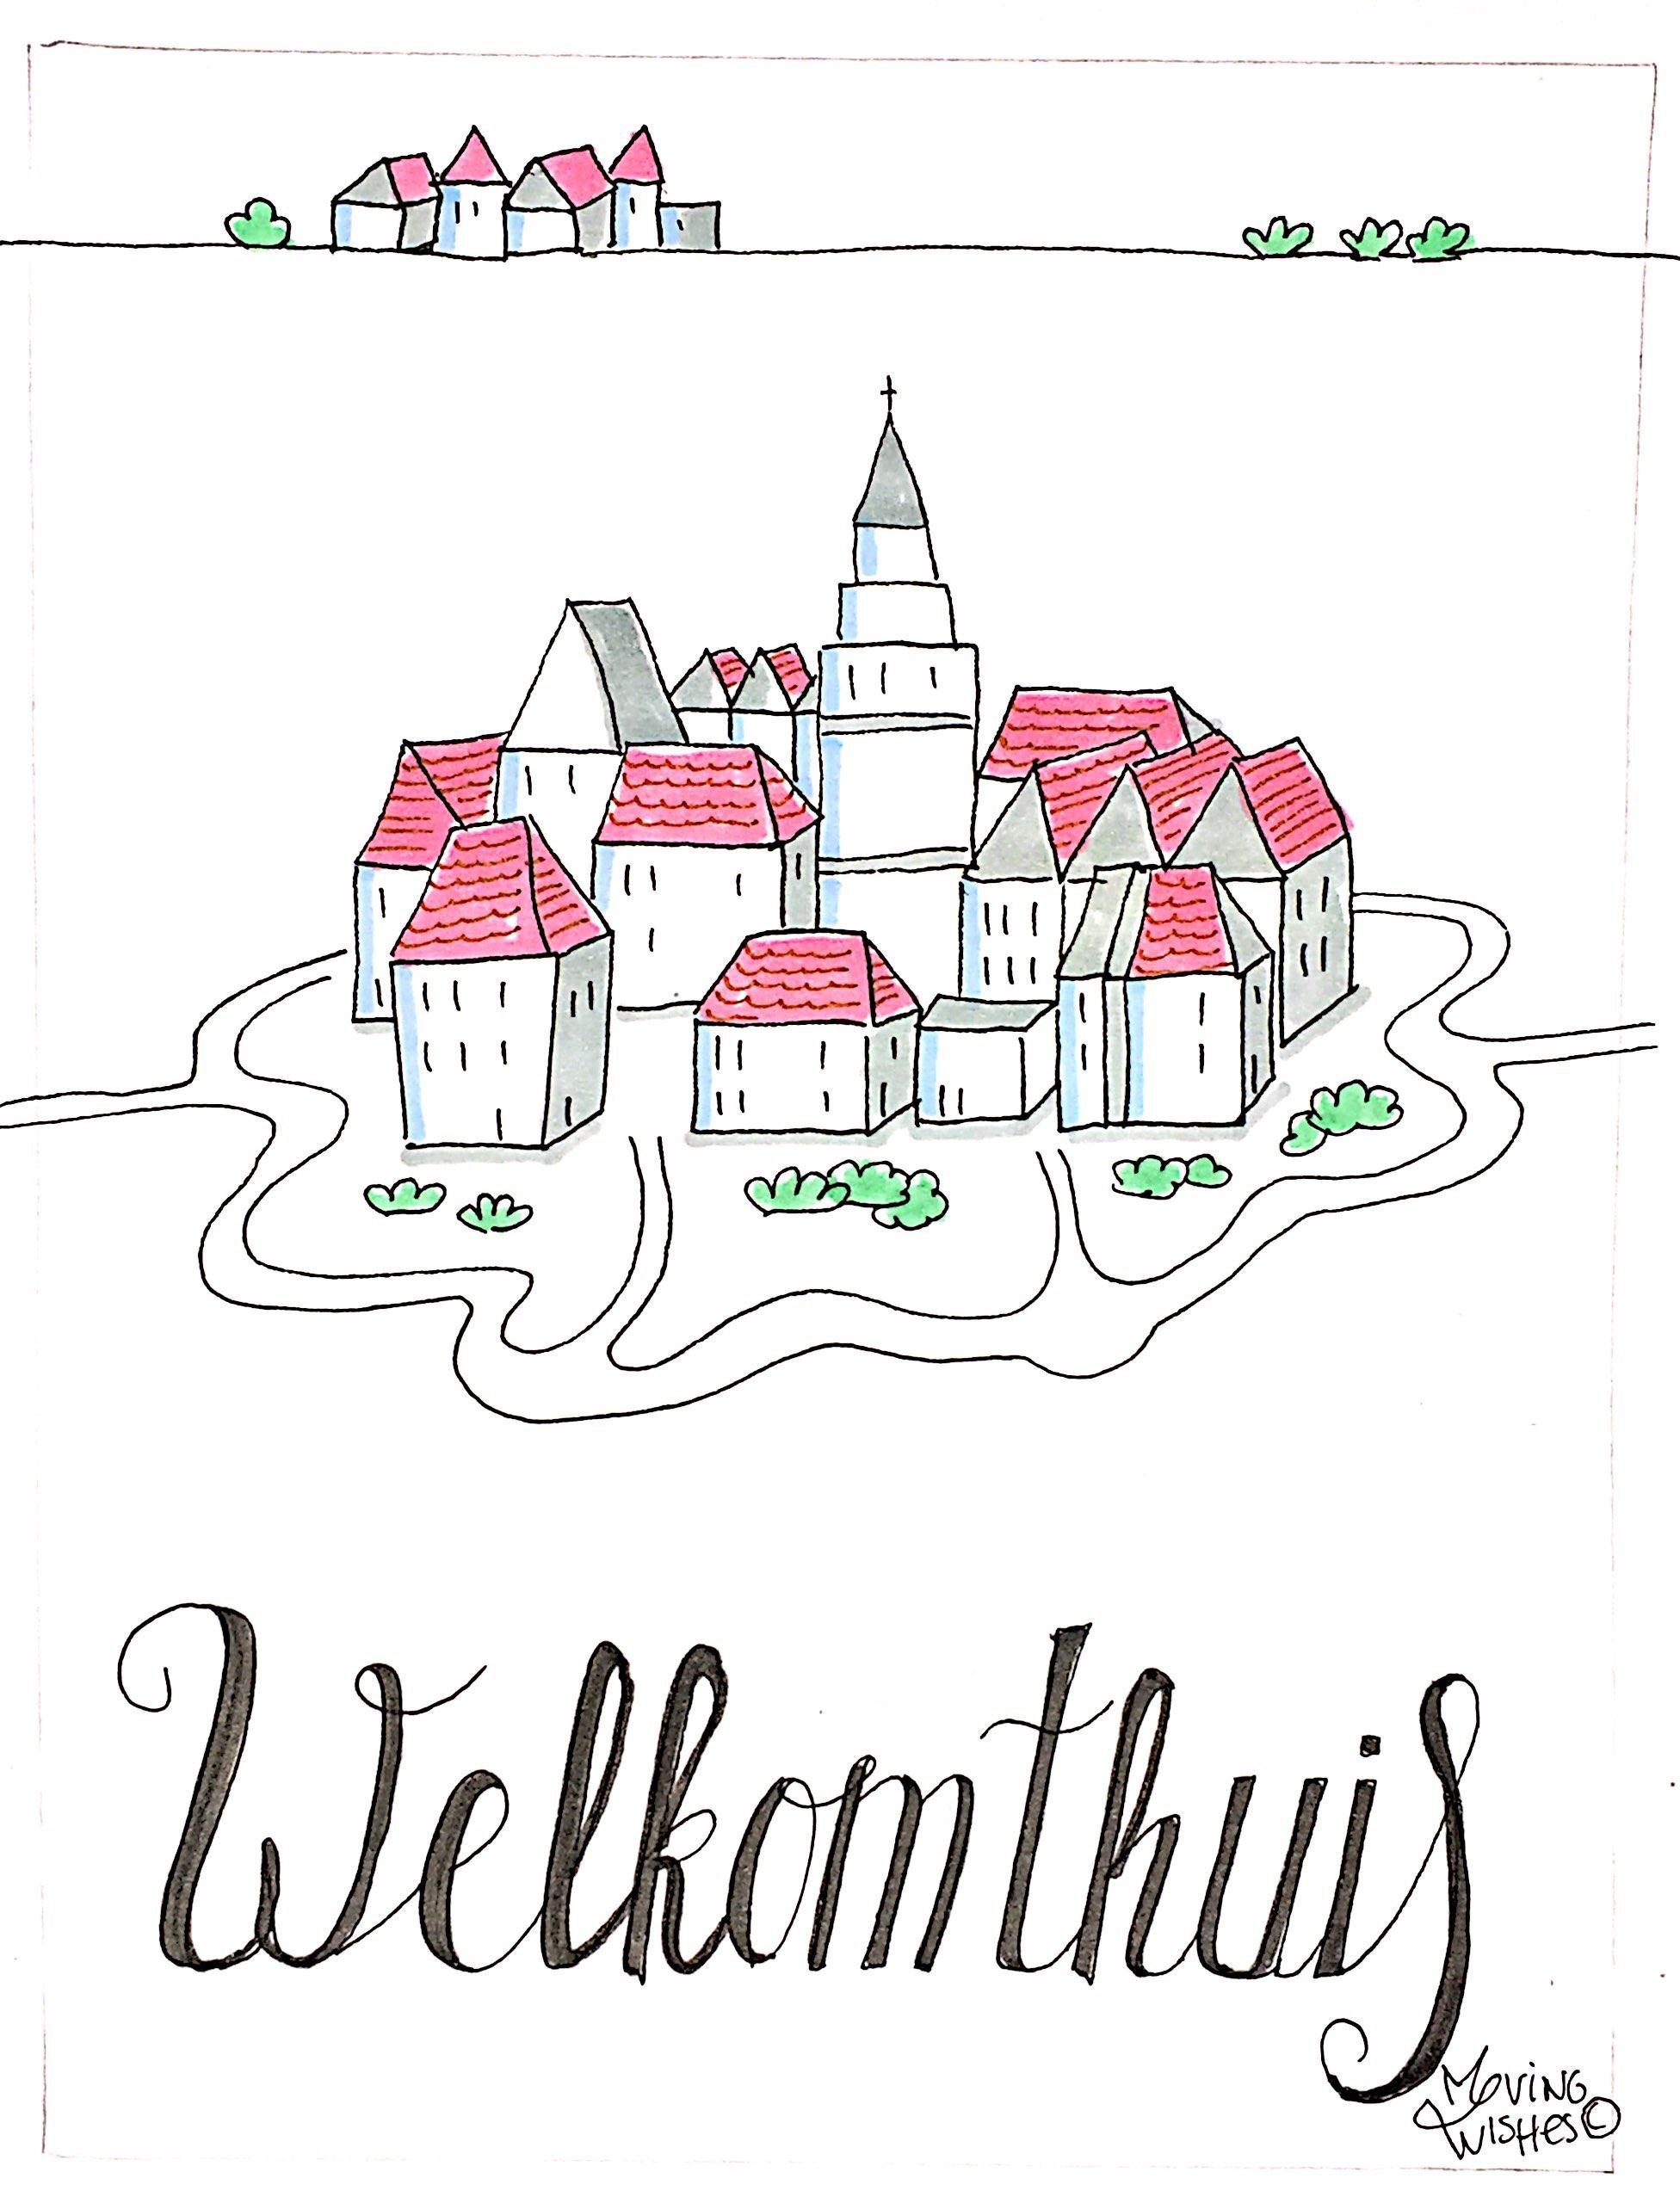 Wenskaart welkom thuis.